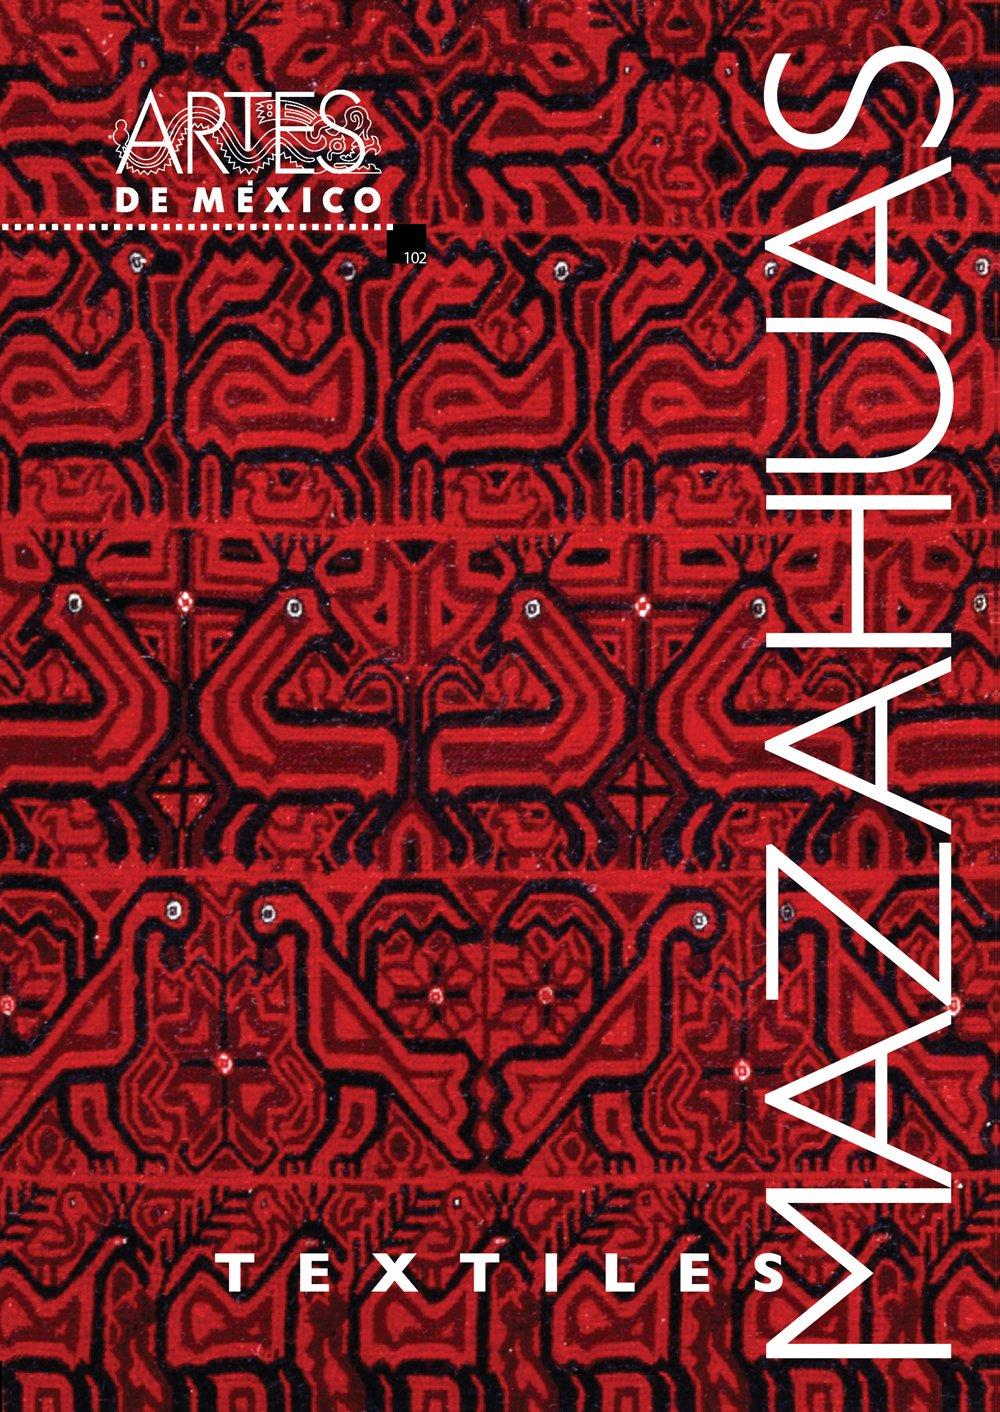 Download Textiles mazahuas. Artes de Mexico # 102 (bilingual: Spanish/English) (Spanish and English Edition) PDF